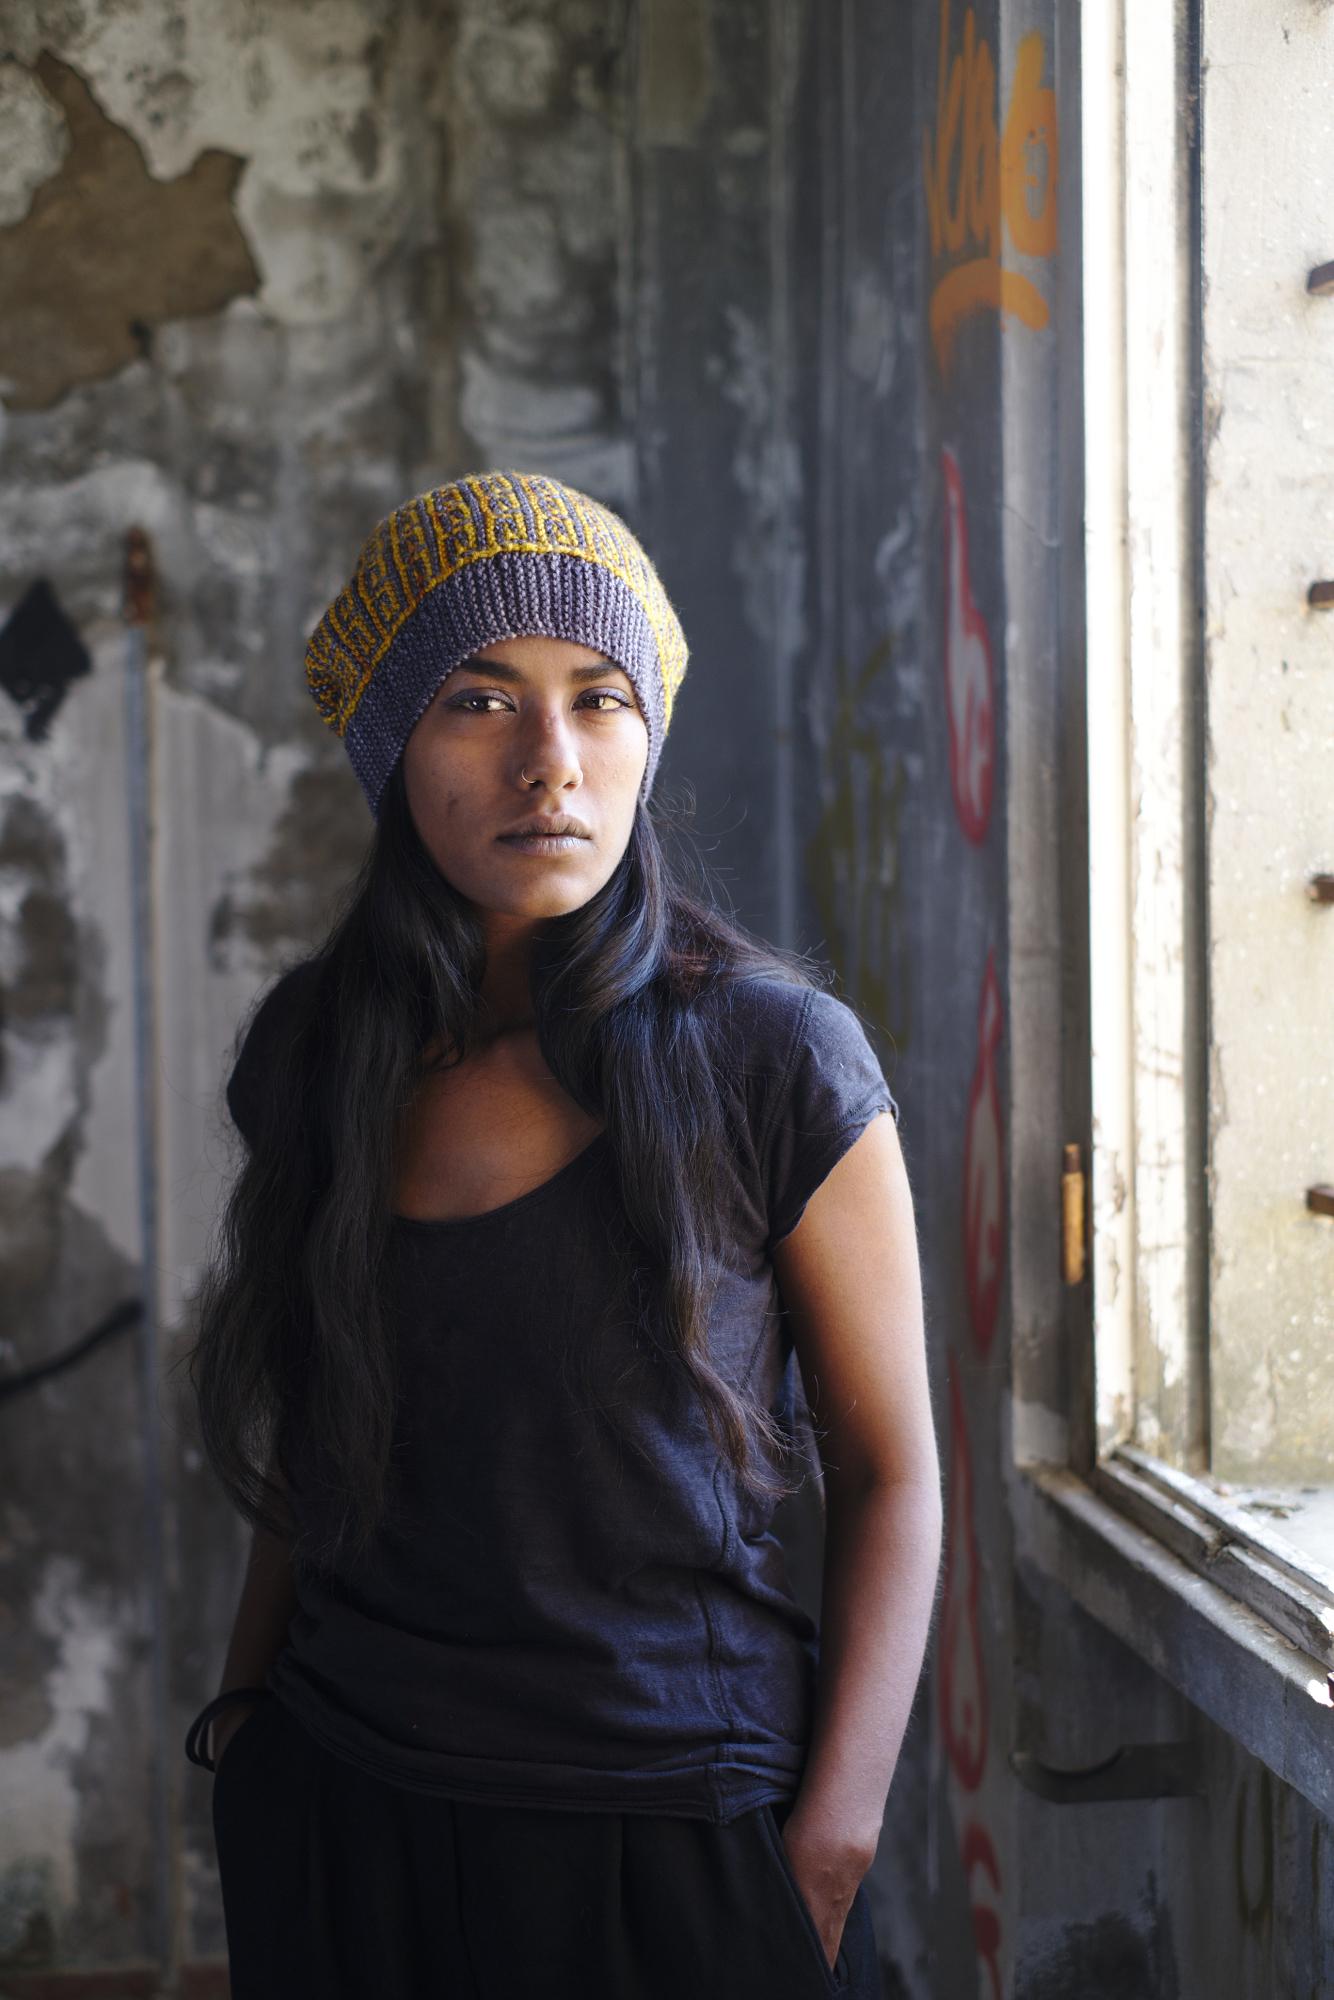 Revolutions sideways knit mosaic hat knitting pattern for dk weight yarn